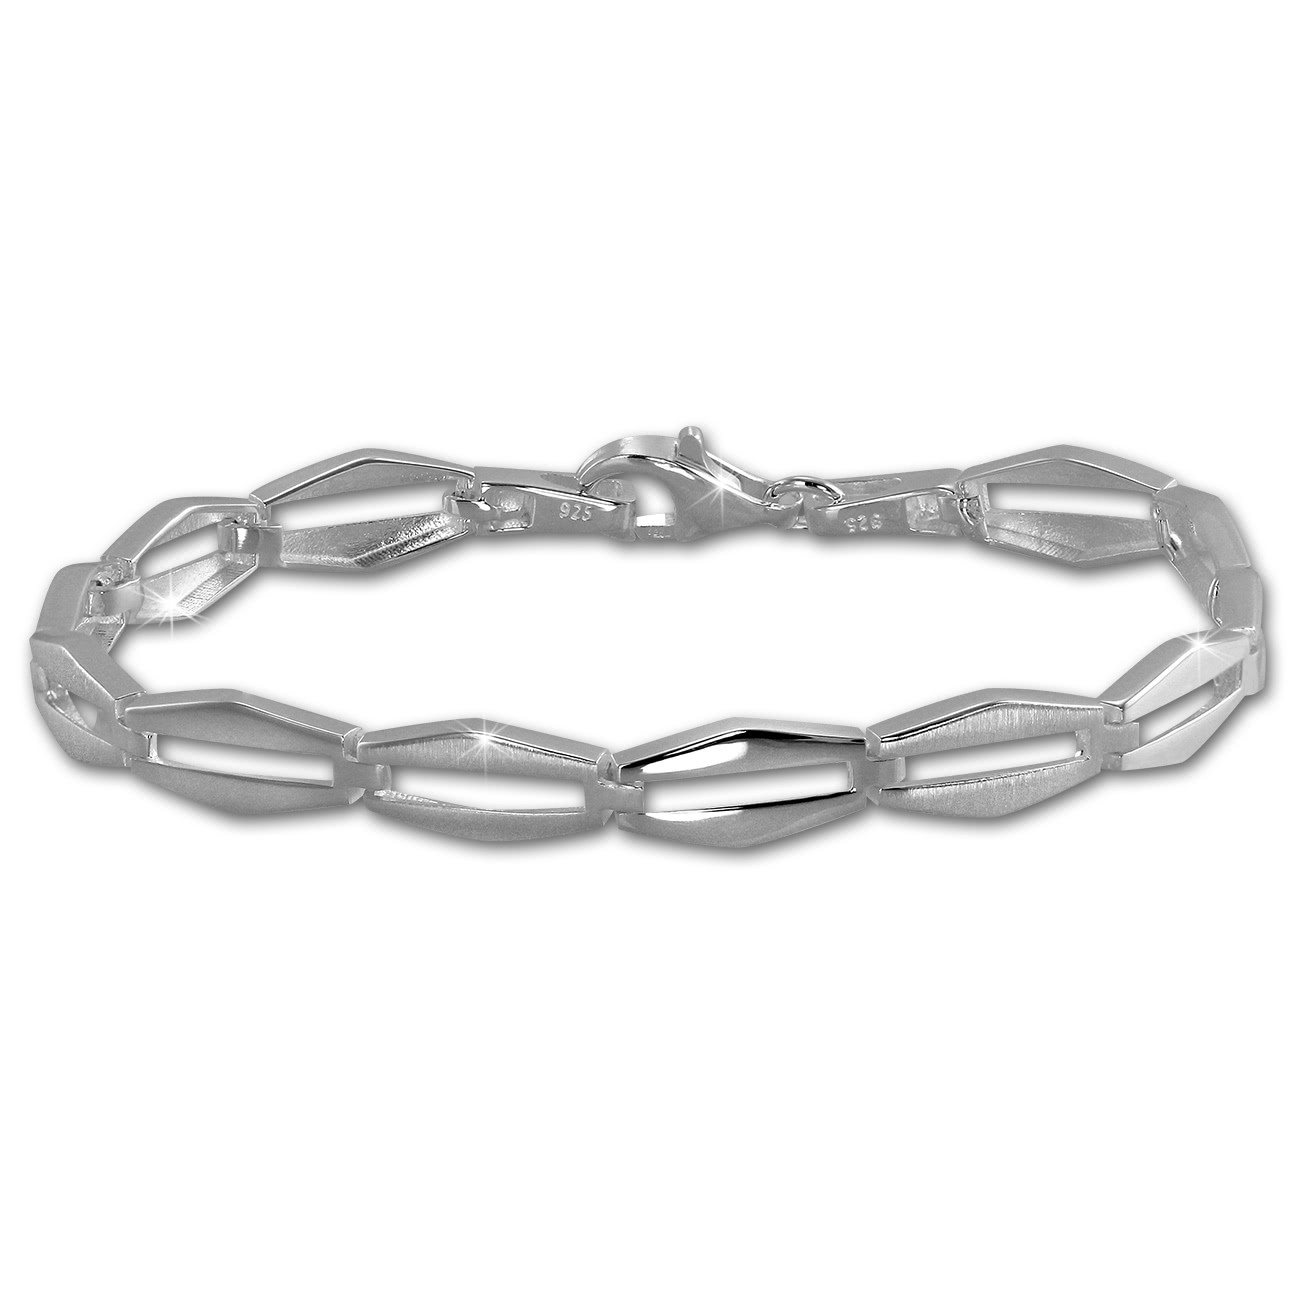 SilberDream Armband Raute matt/glänzend 925 Sterling Silber 19,5cm SDA459J